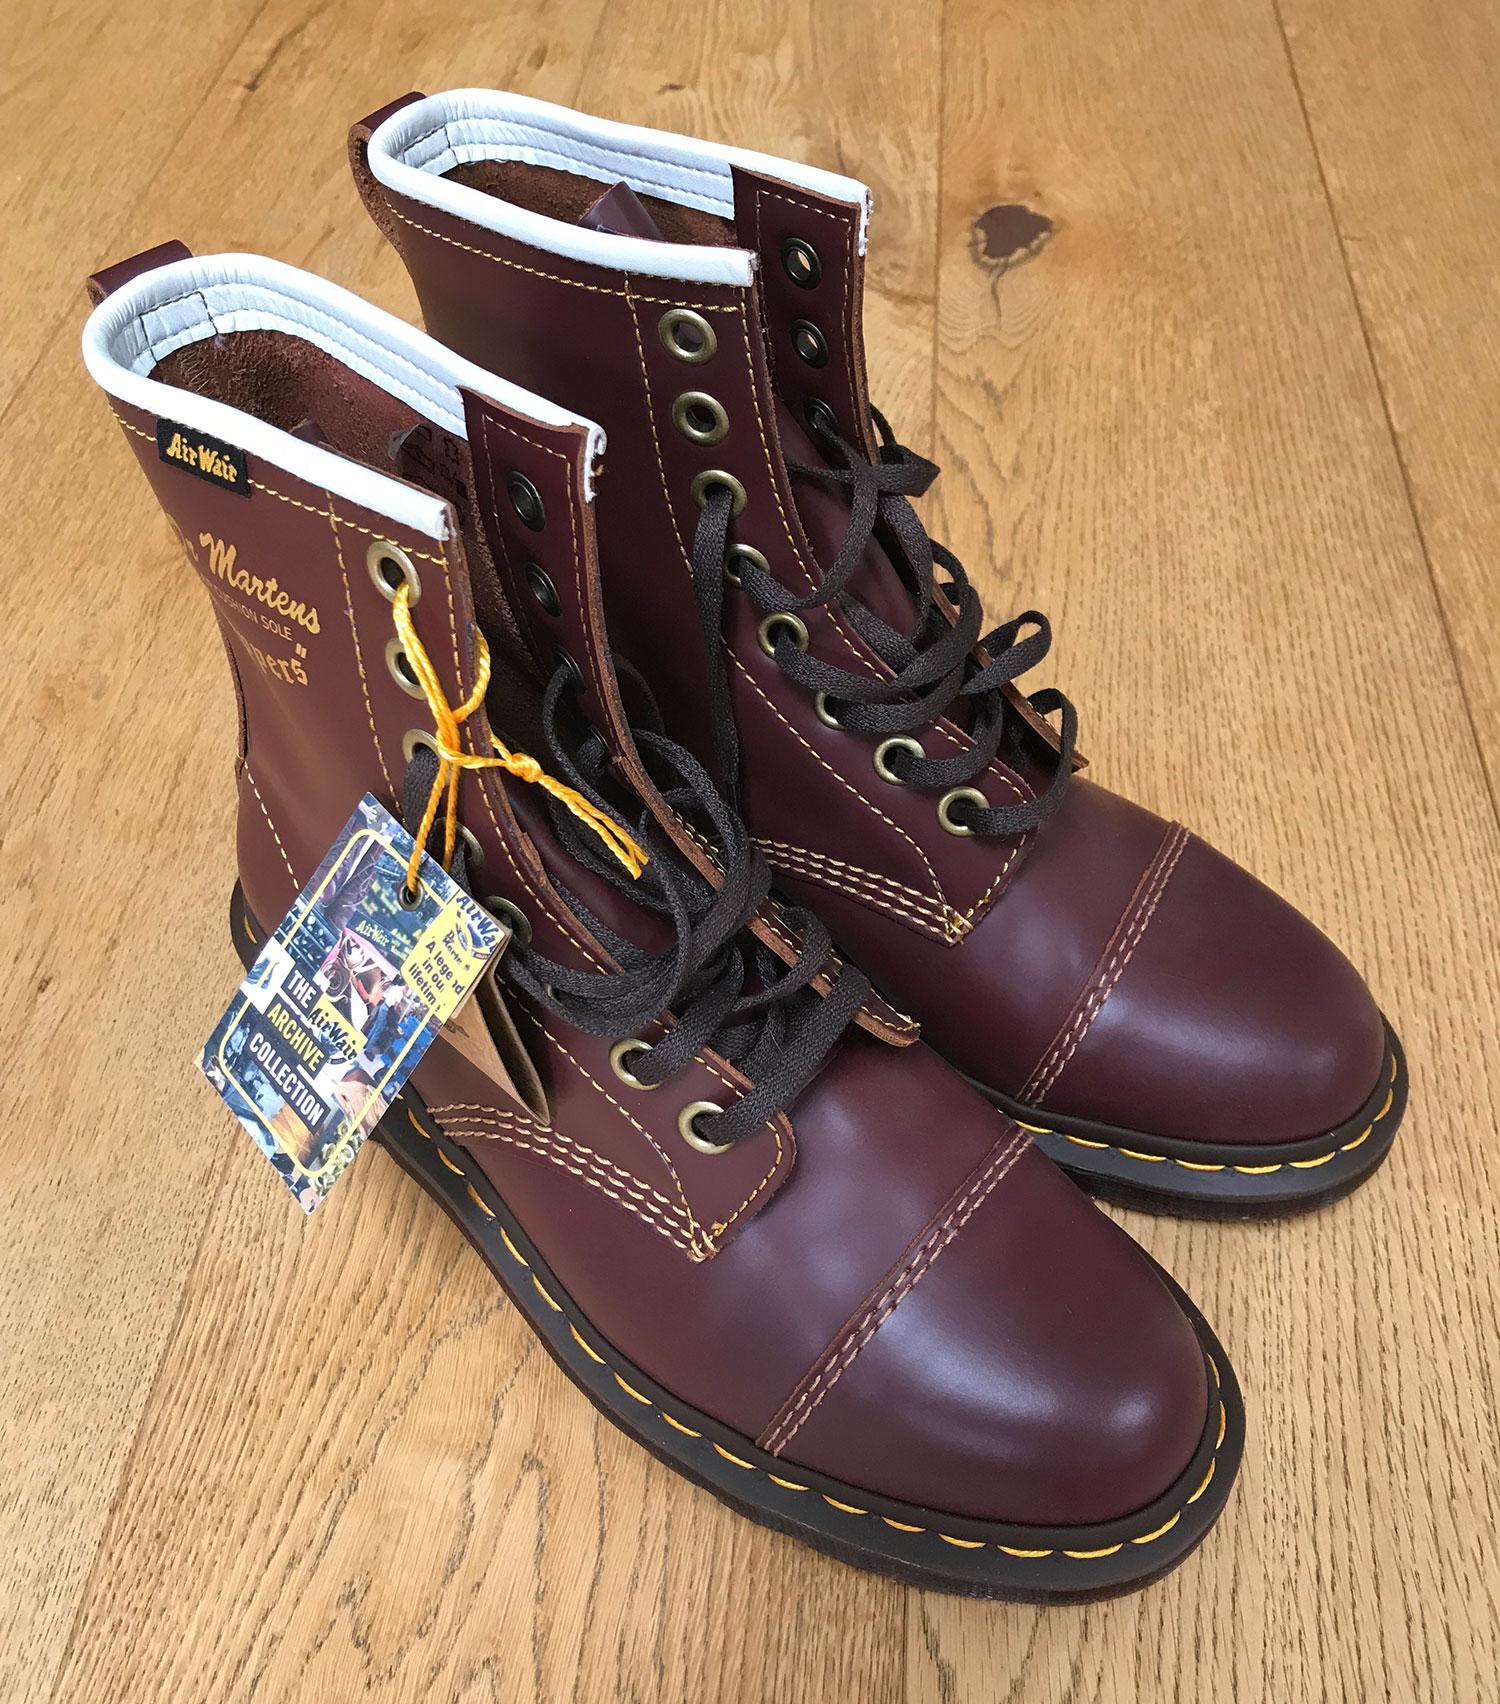 Dr.-Martens-Capper-boots-in-oxblood.jpg